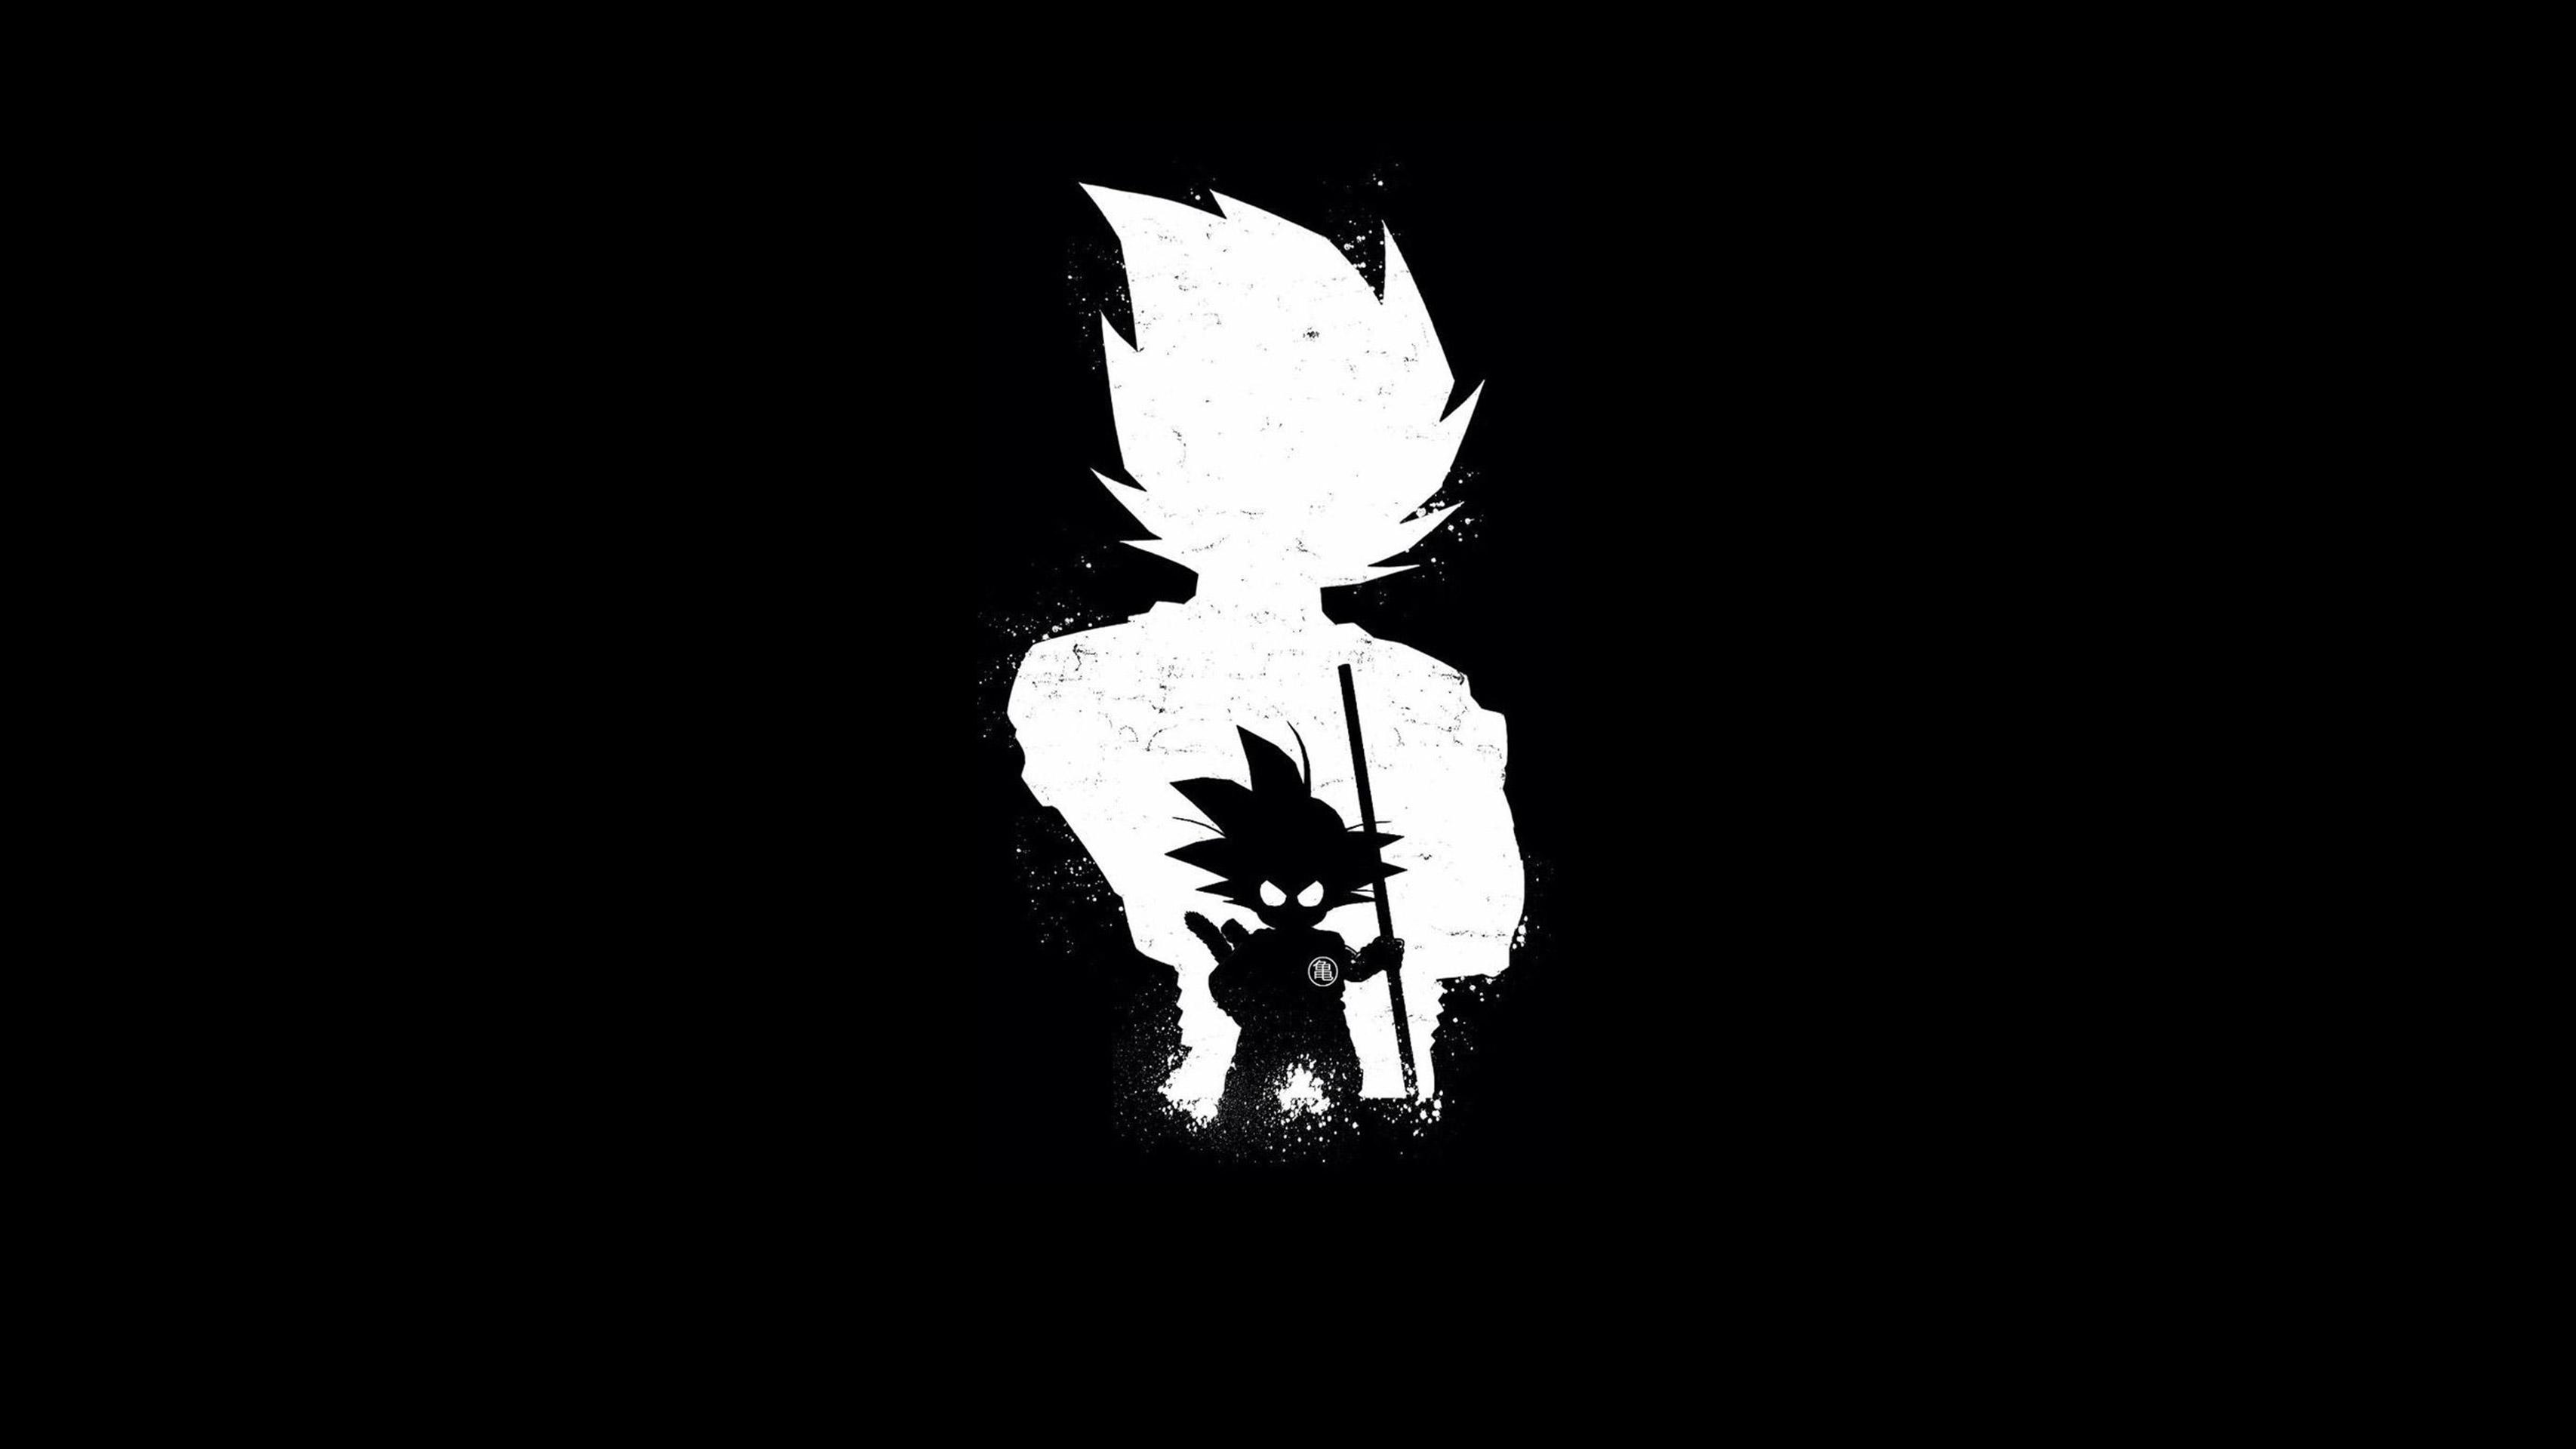 Goku Anime Dark Black Wallpaper Hd Anime 4k Wallpapers